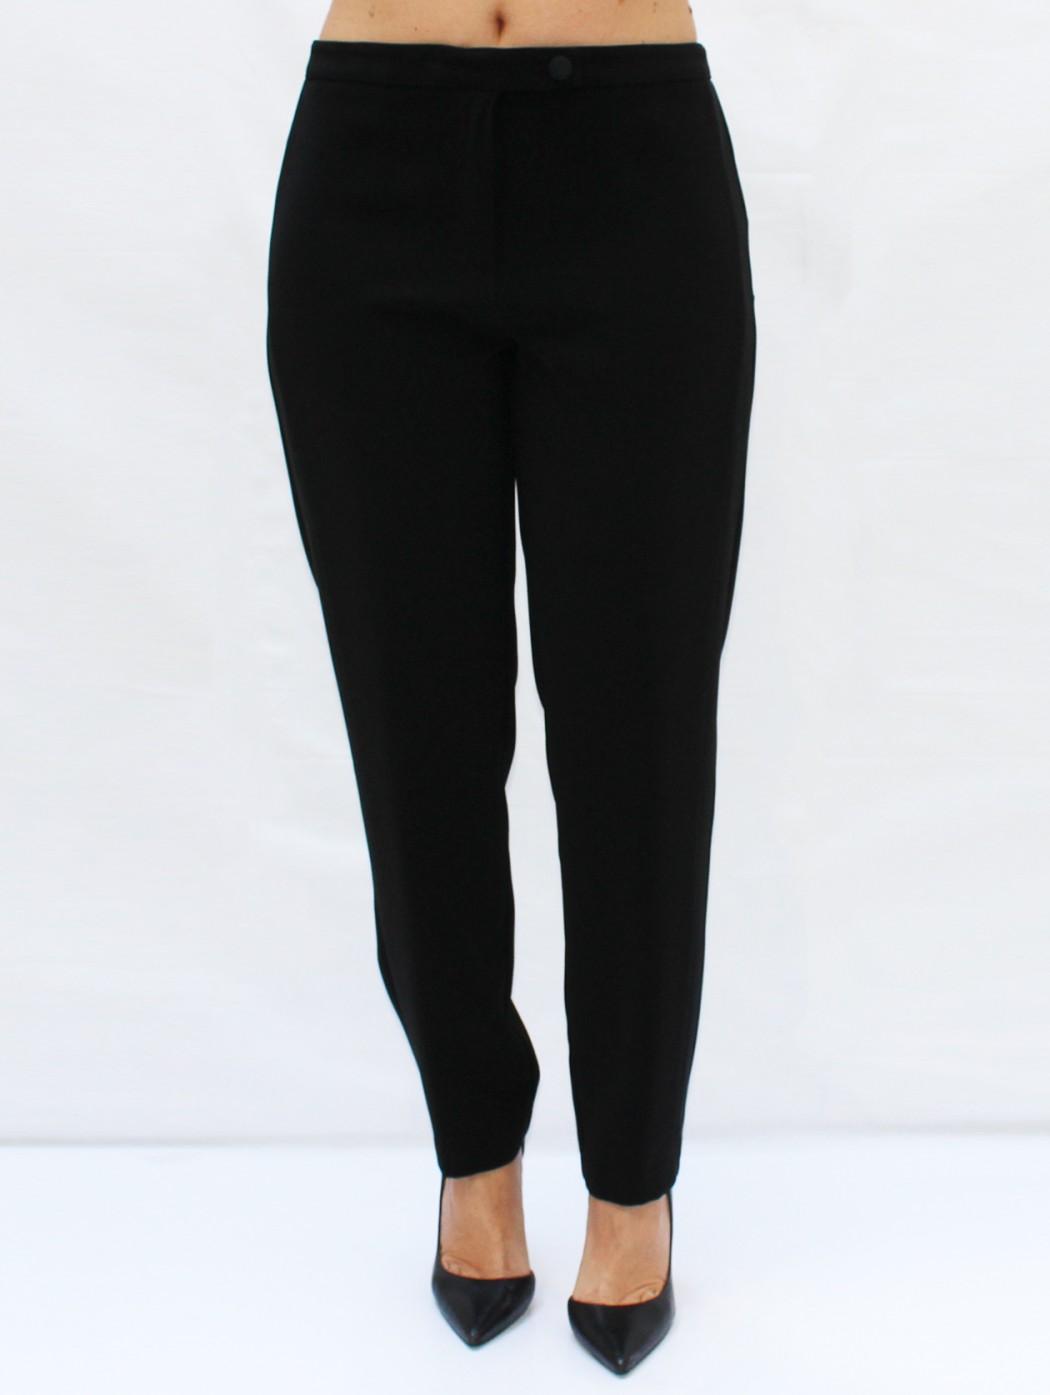 Pantaloni neri con banda...